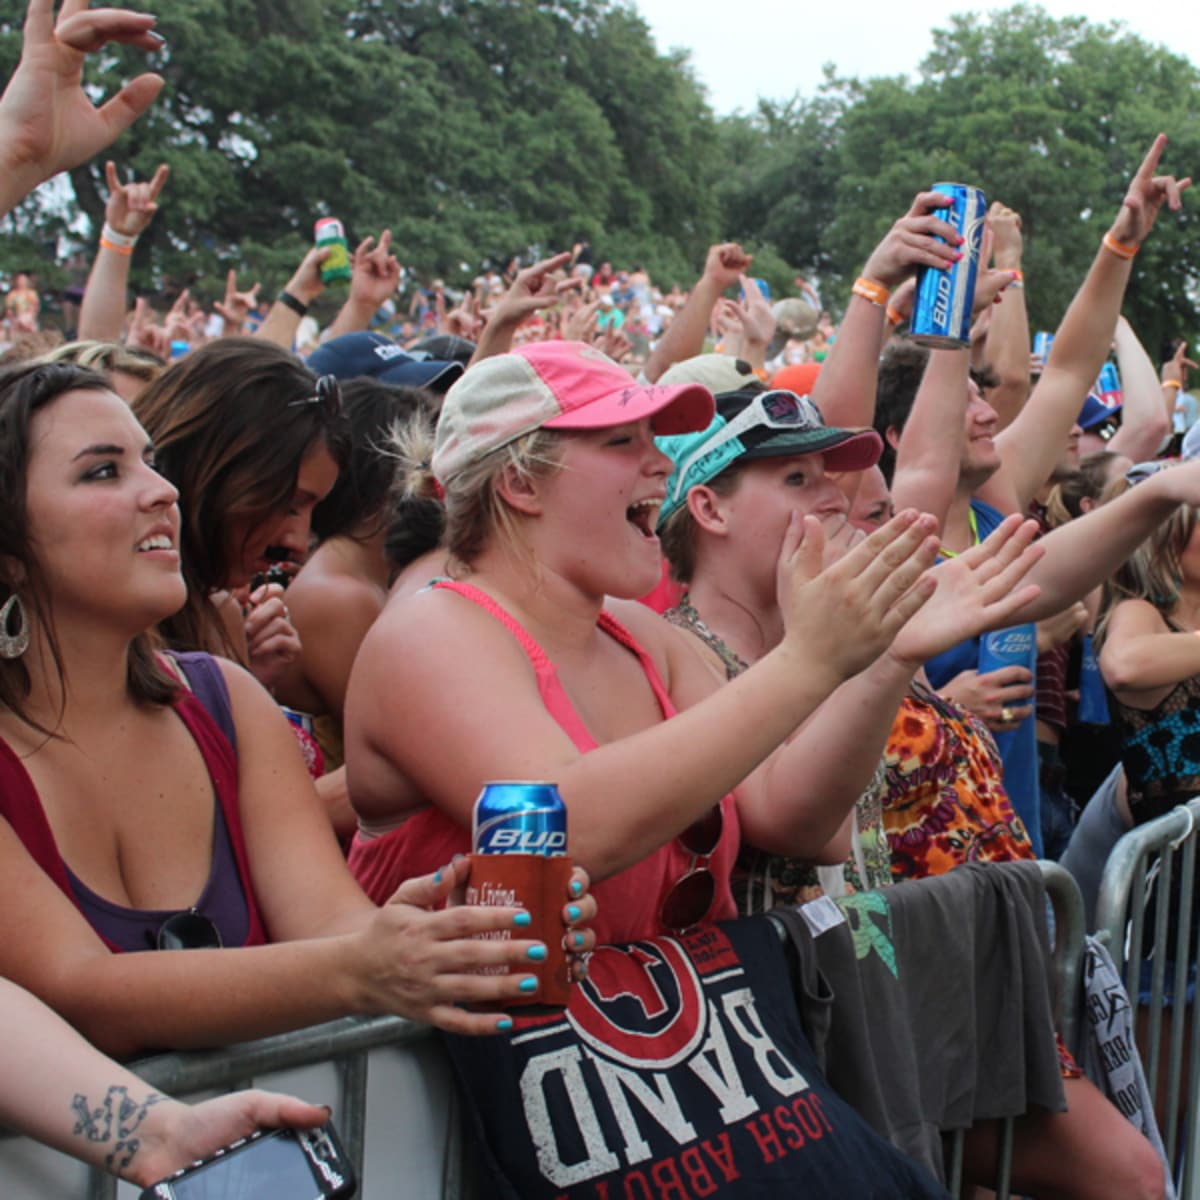 Austin Photo Set: News_meredith_lone star jam_jan 2013_crowd